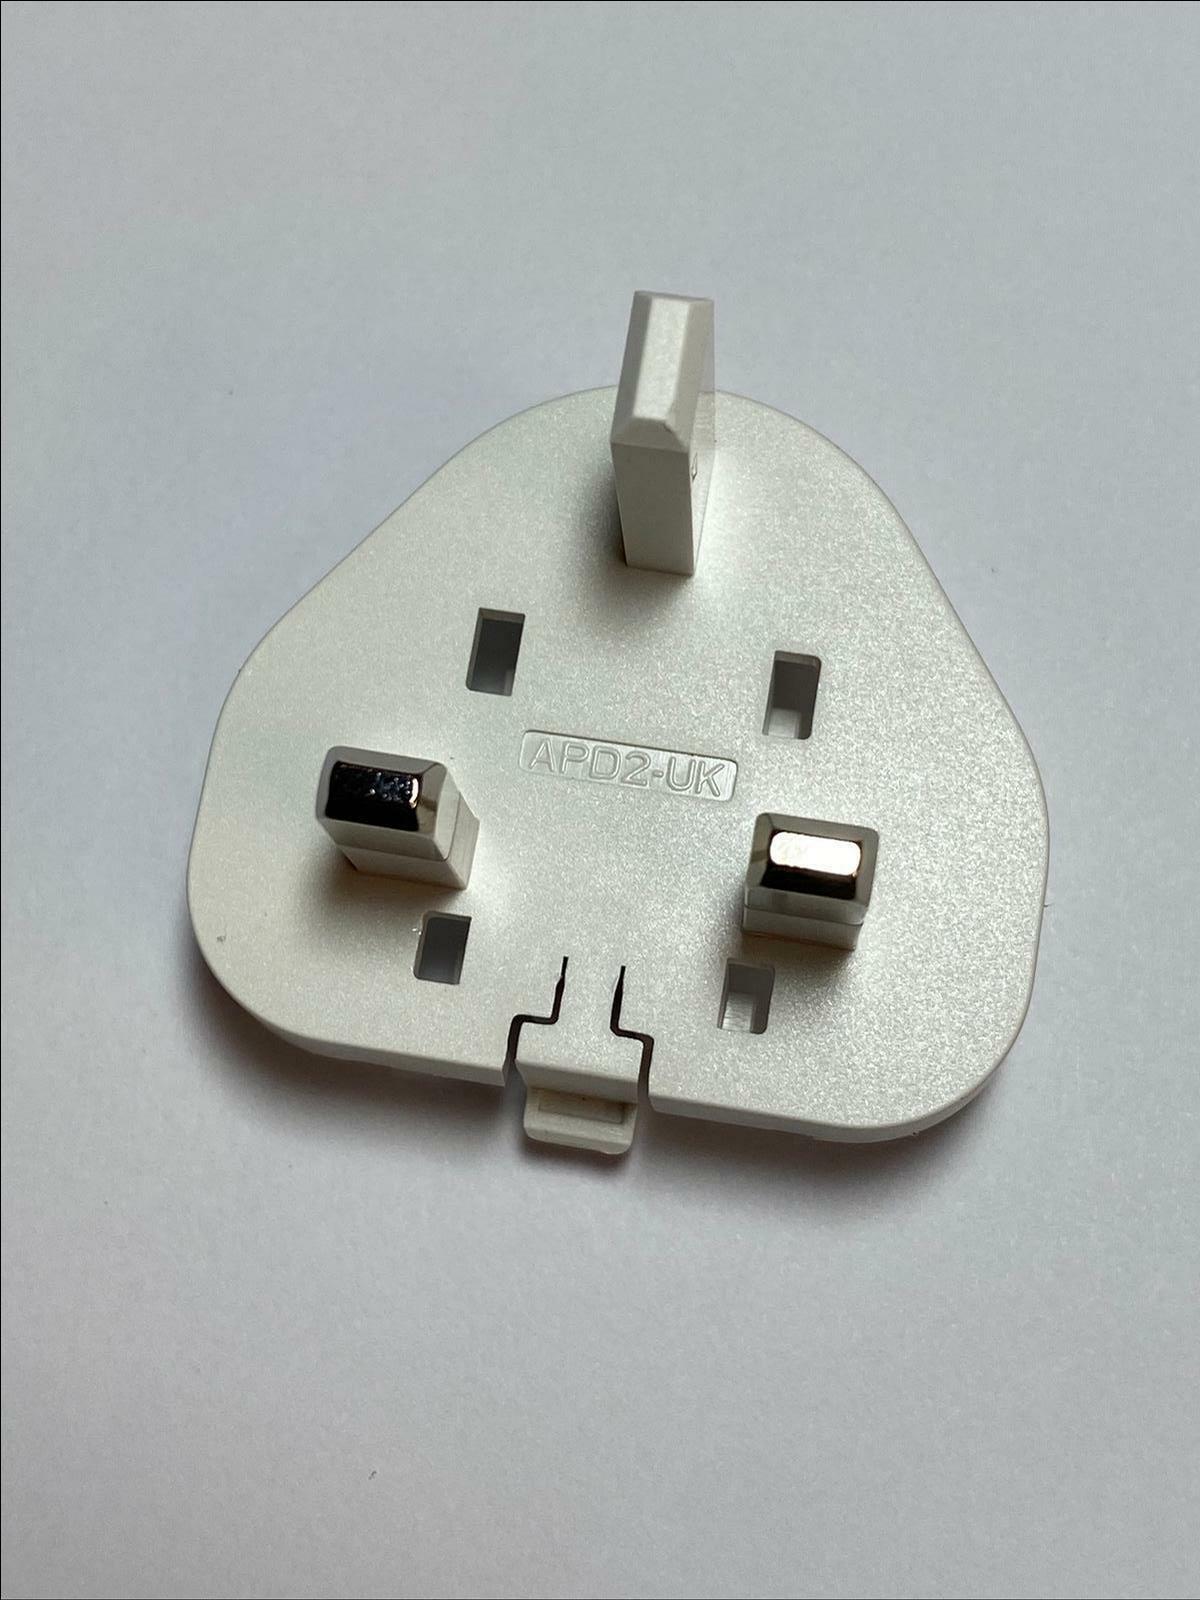 White UK Slide Attachment Plug for APD 5V 3A WA-15I05R APD2-UK APD2UK